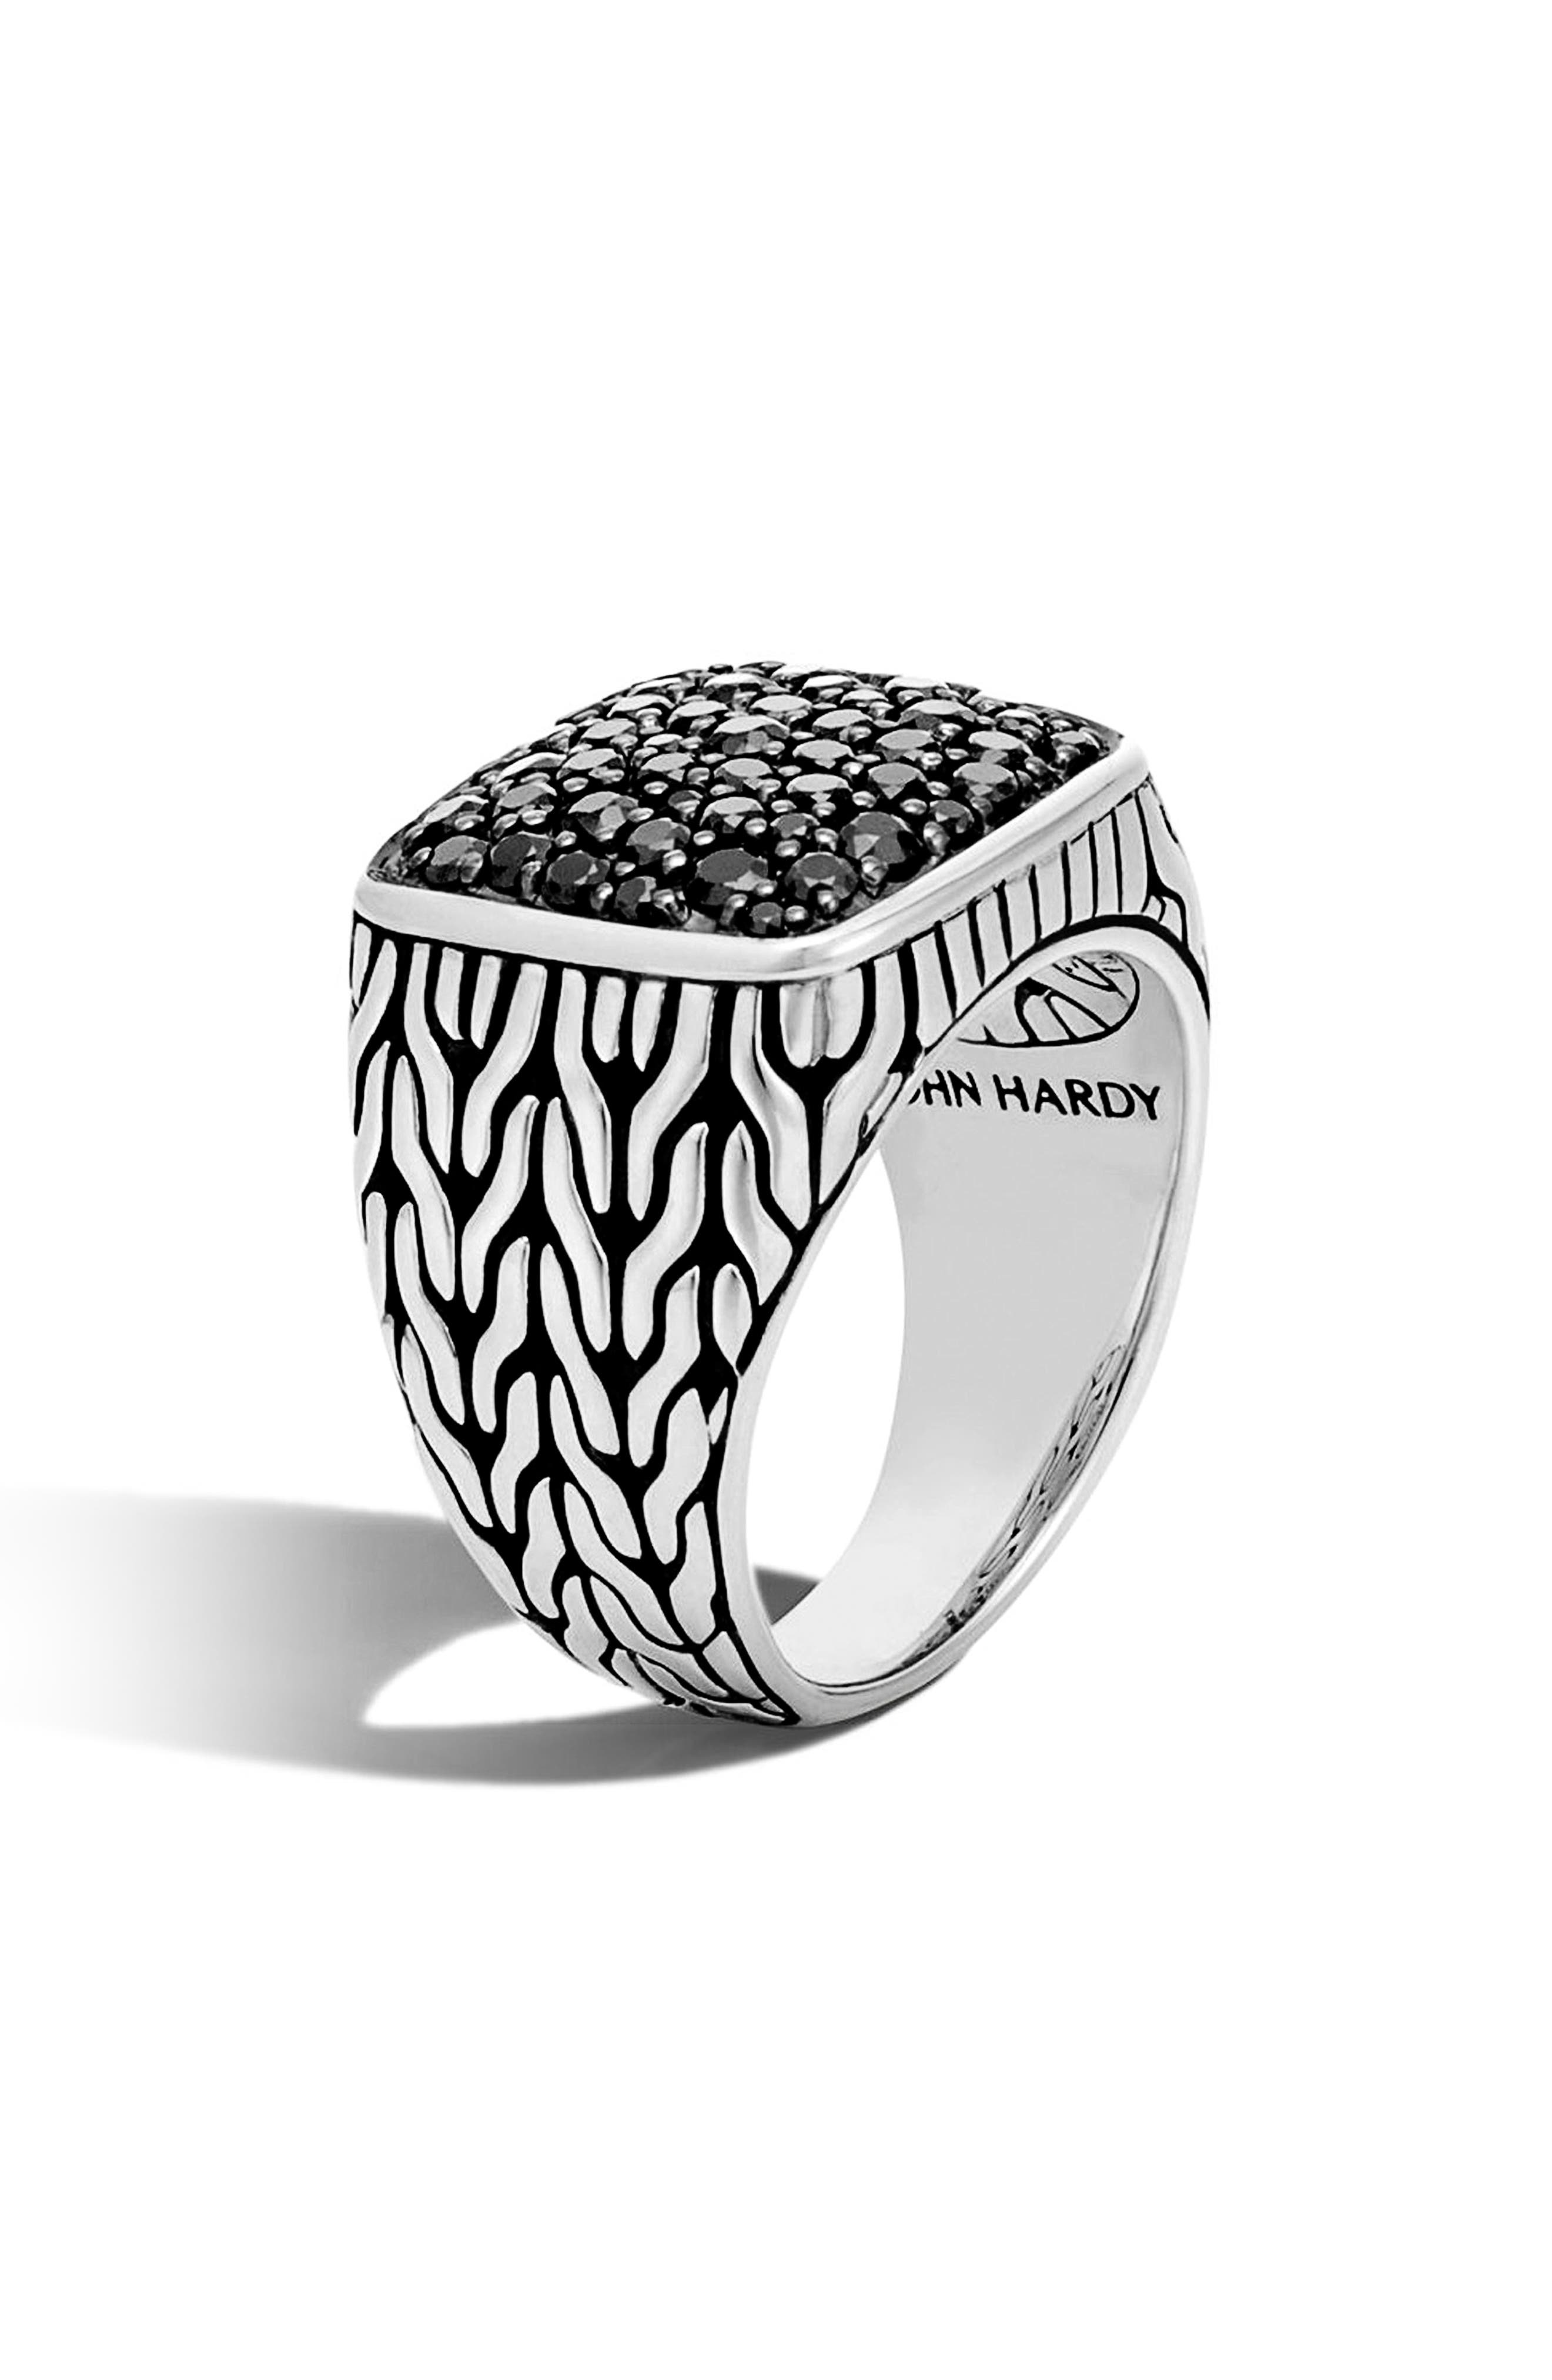 John Hardy Classic Chain Silver Signet Ring